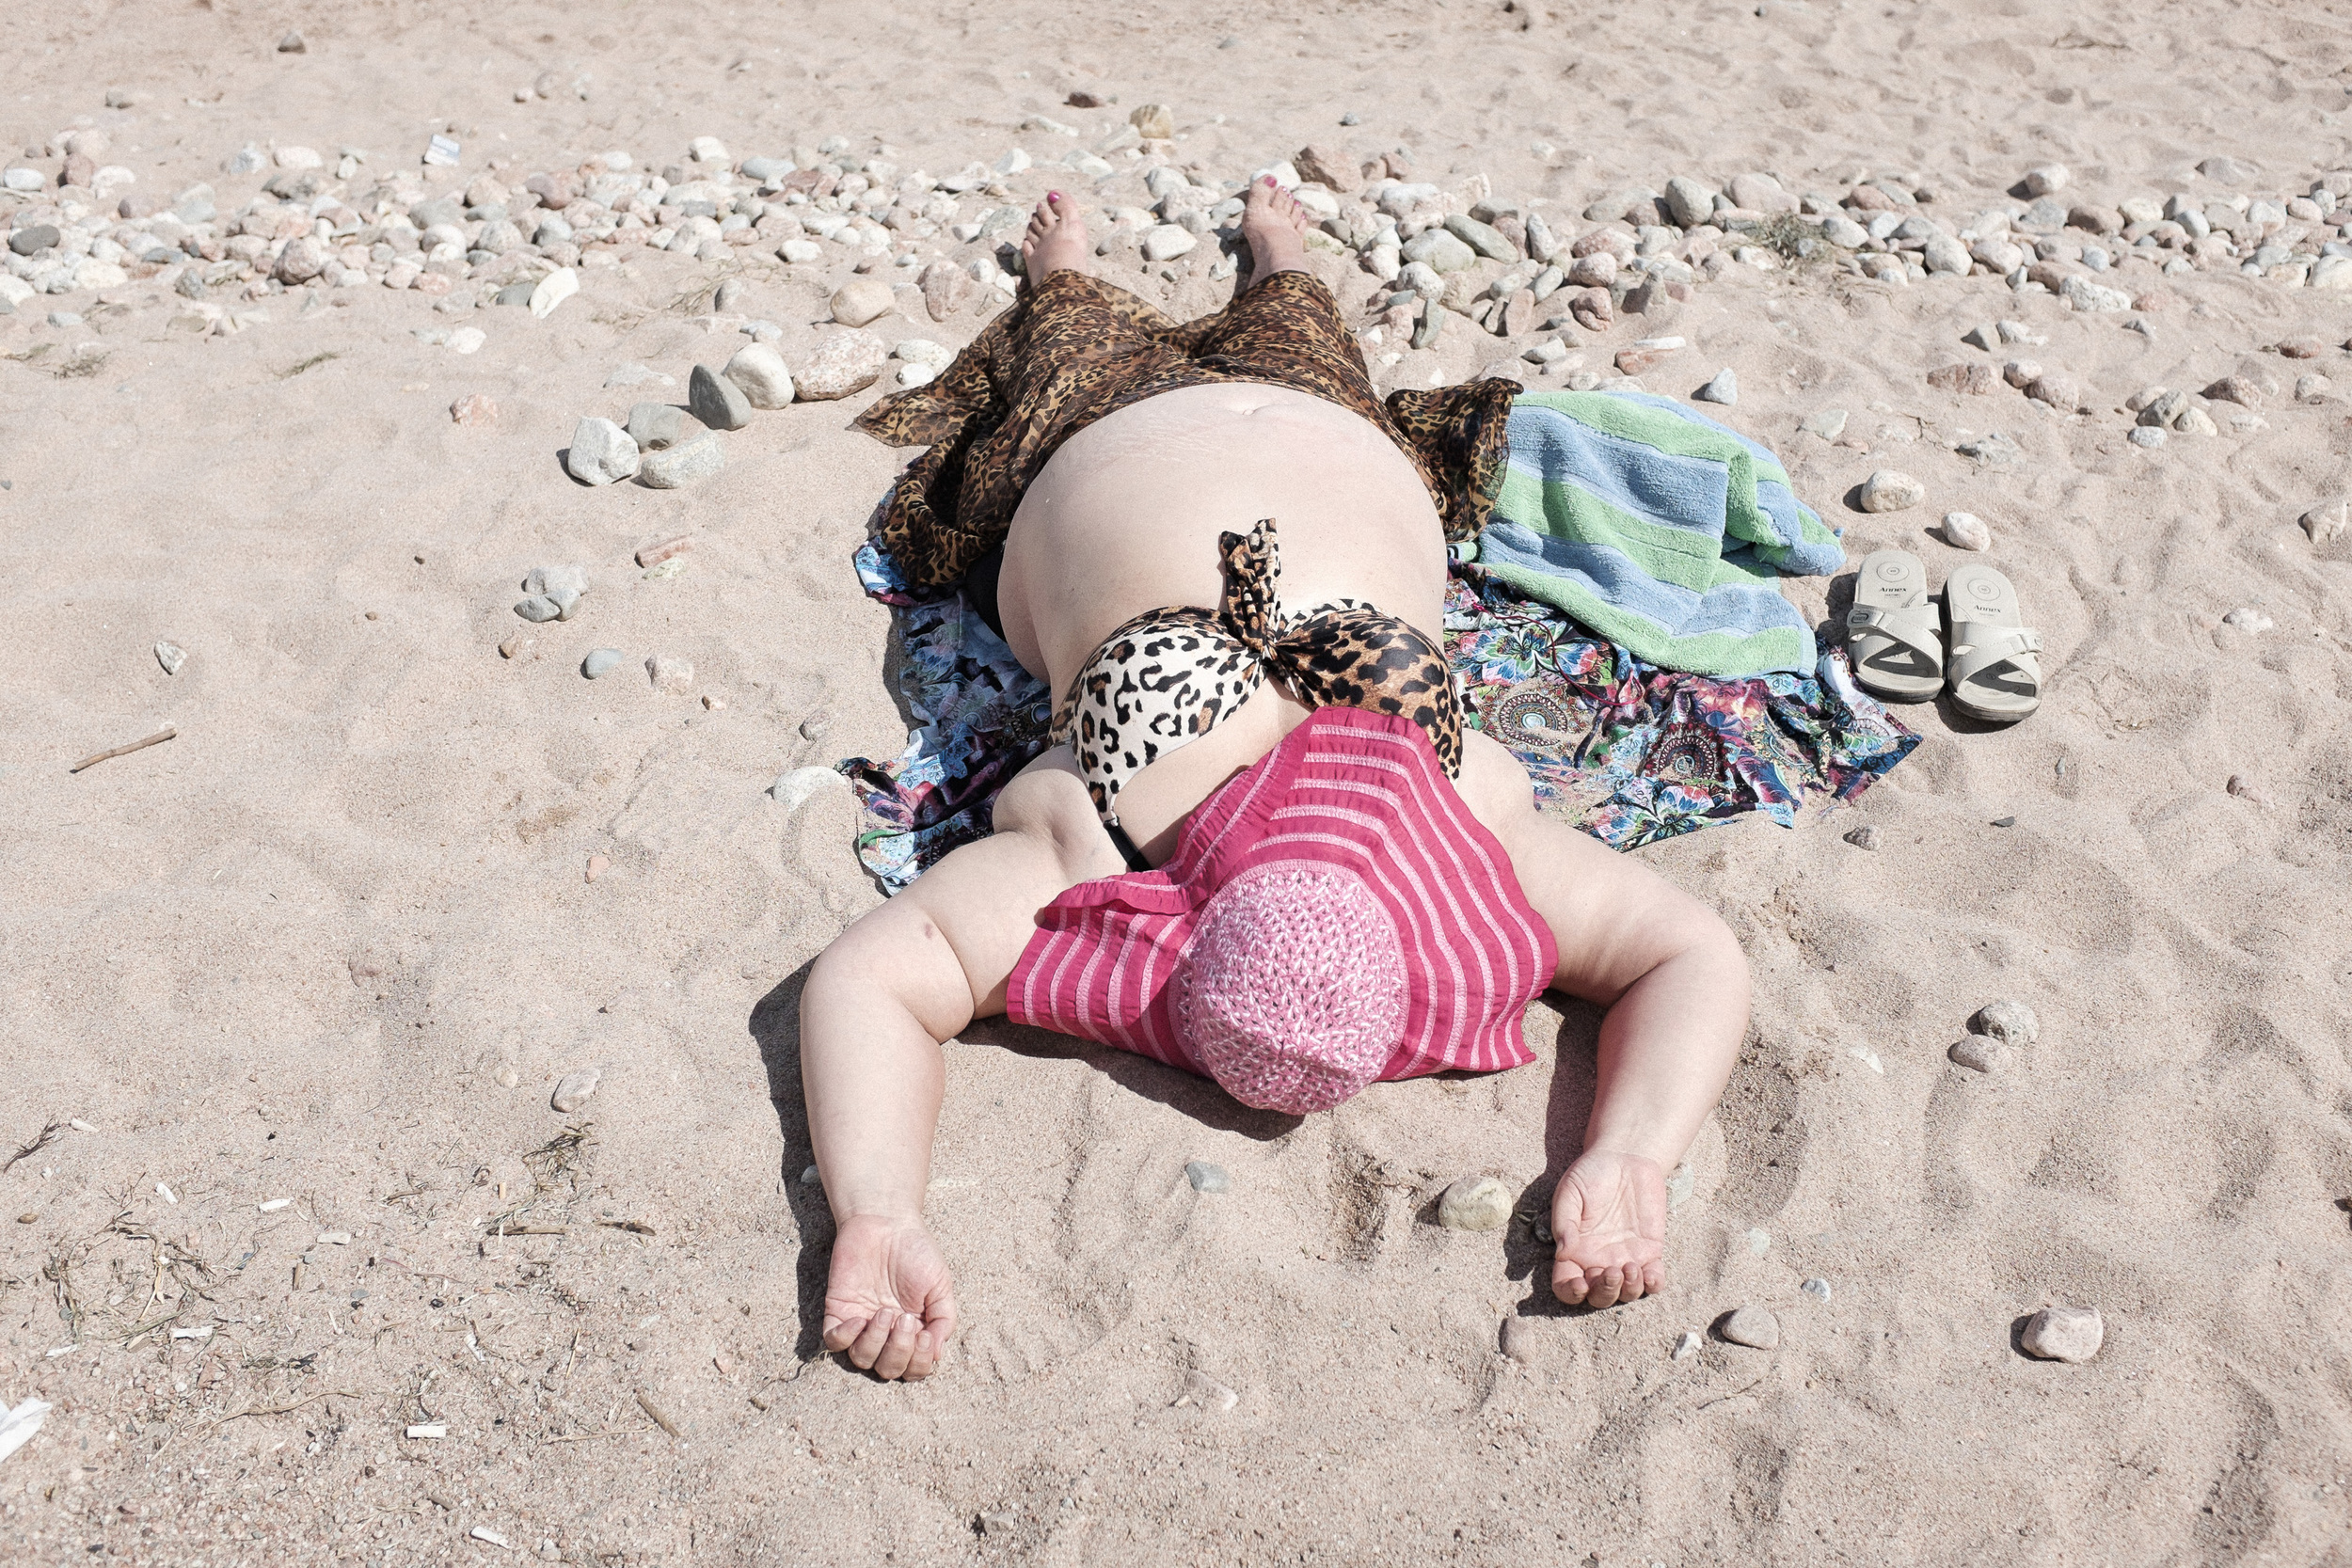 Russian tourist having sunbath. Bosteri village, Issyk-Kul lake.